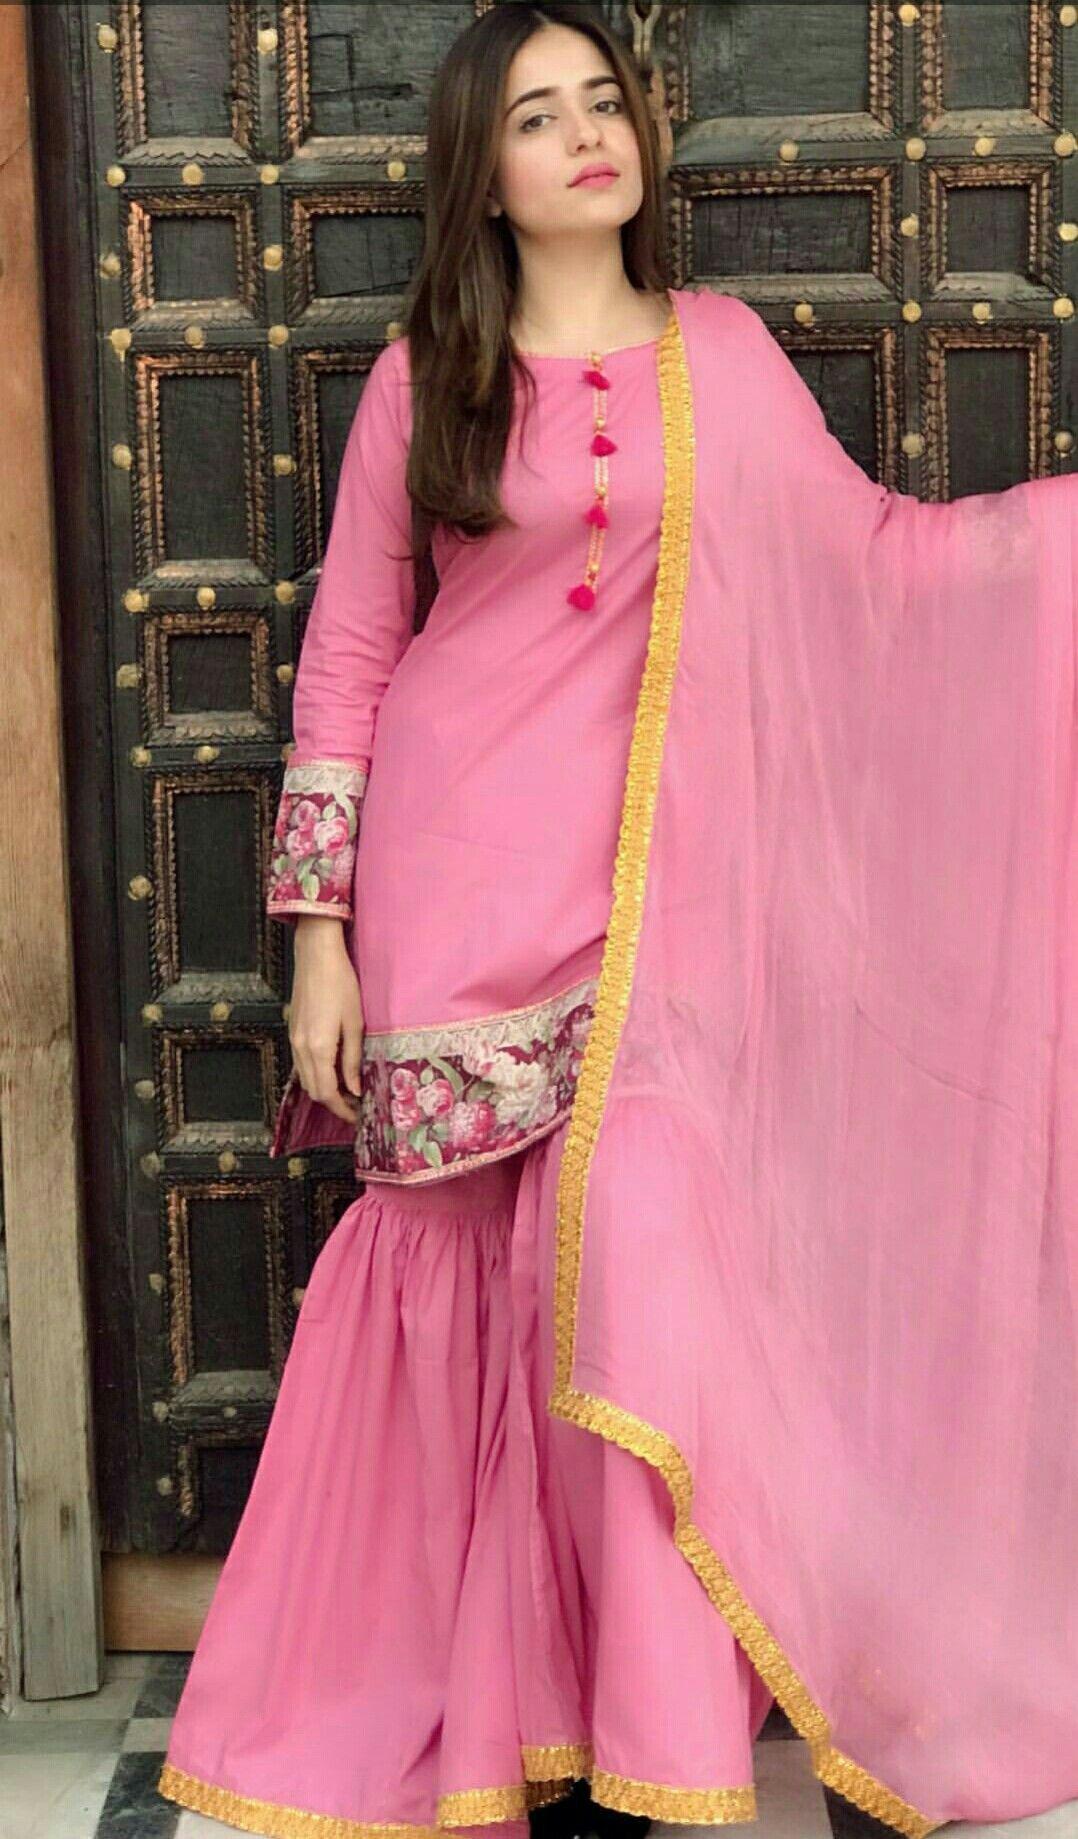 aa1ea9a3f7 Discover ideas about Pakistani Outfits. Women S Fashion Dresses Wholesale.  Pakistani OutfitsIndian OutfitsIndian DressesGarara SuitDesigner Punjabi ...